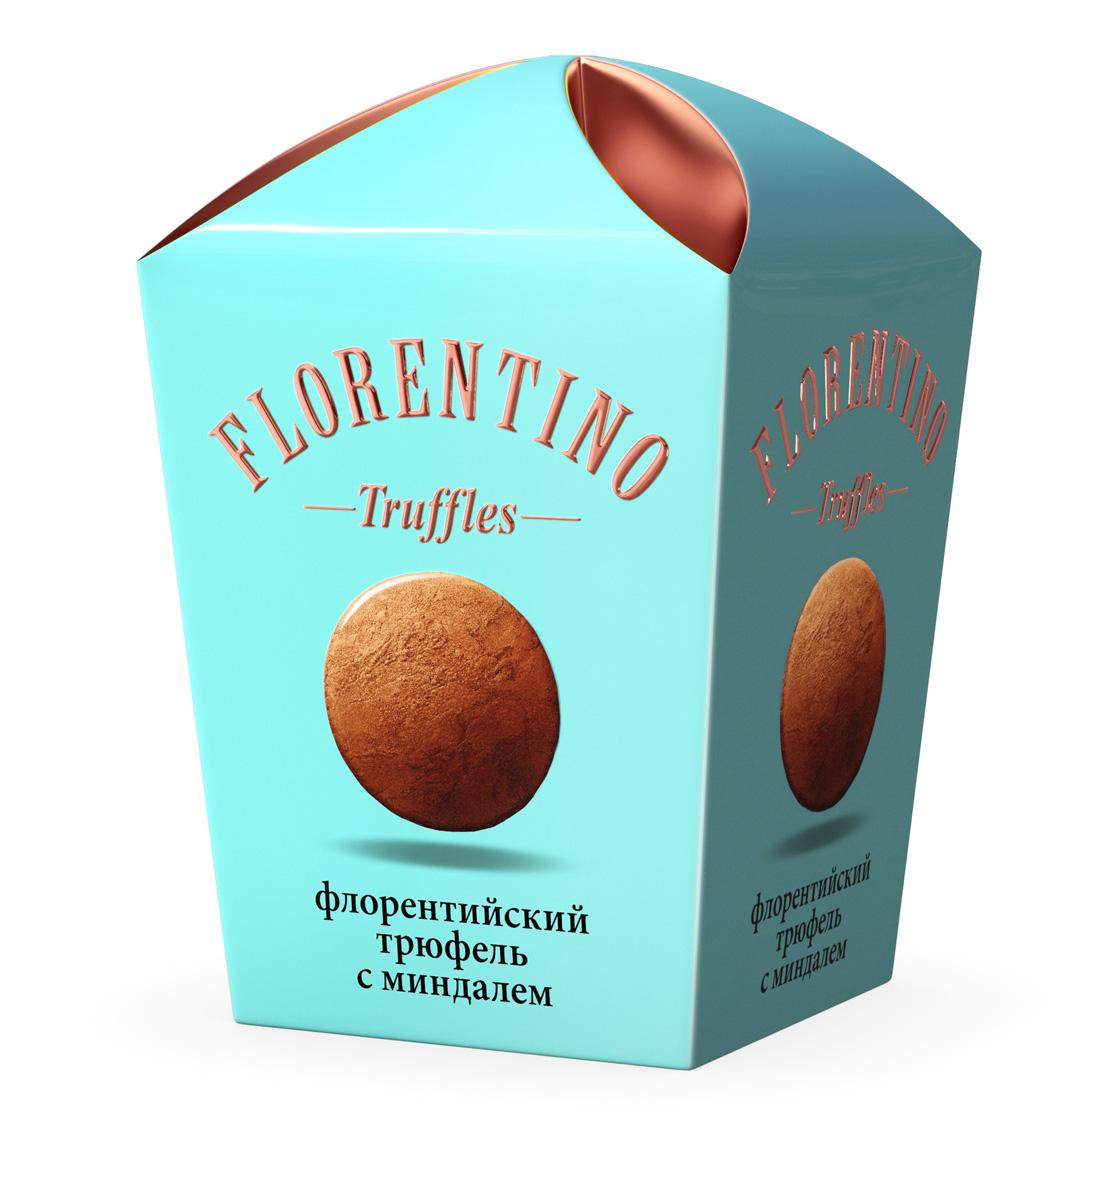 Florentino Флорентийский трюфель конфеты с миндалем, 175 г конфеты jelly belly 100g